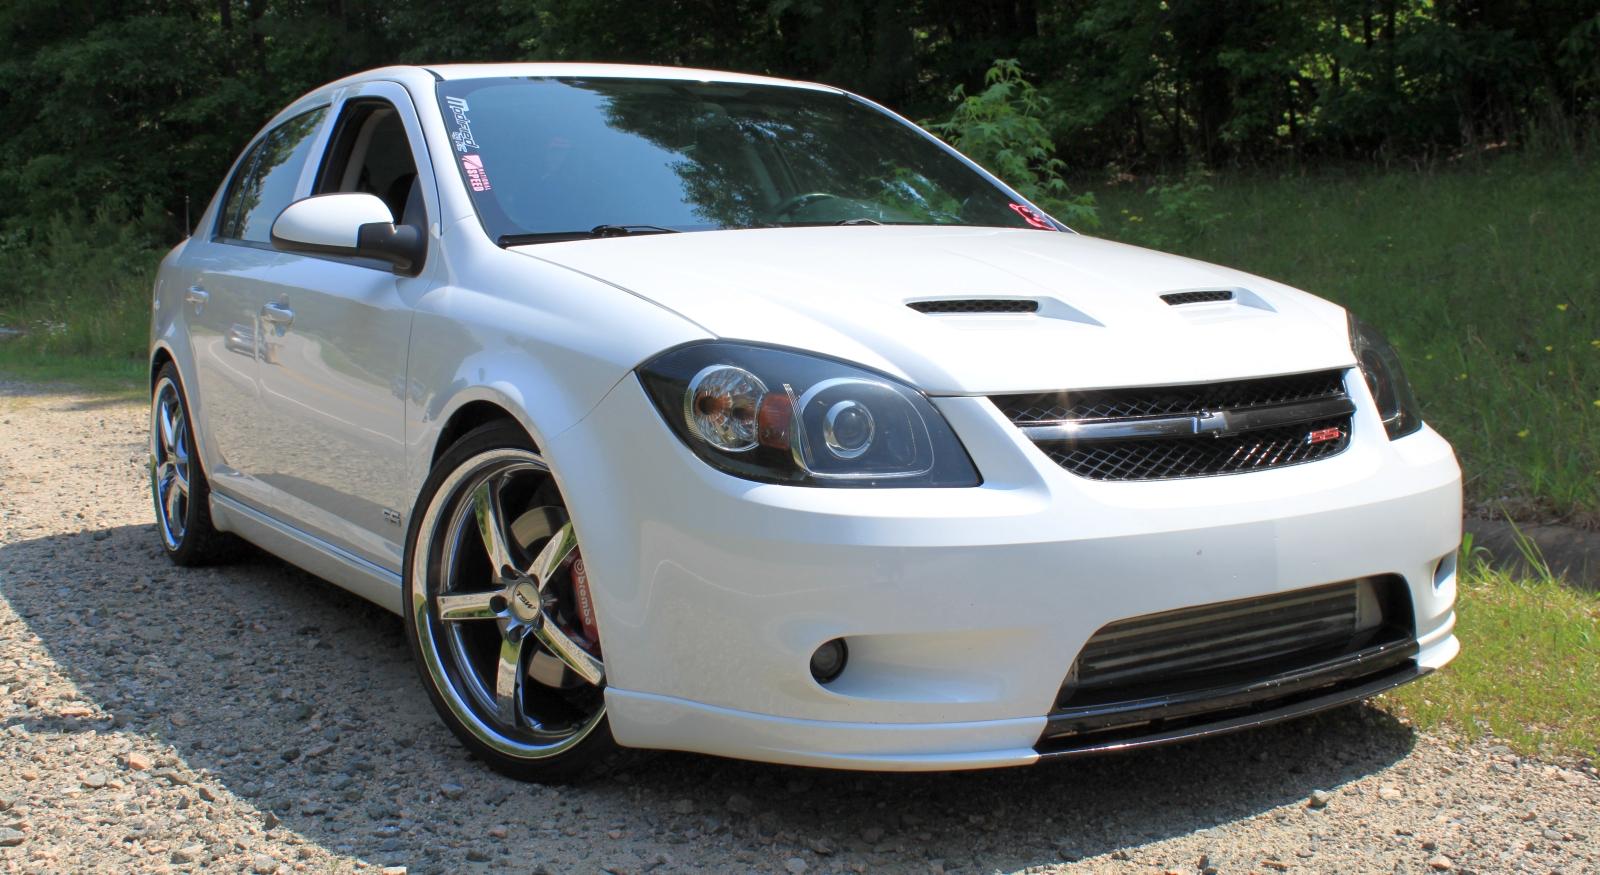 Cobalt 2008 chevy cobalt sport specs : Feature Car: Matt Welliver's Cobalt Turbo Sedan